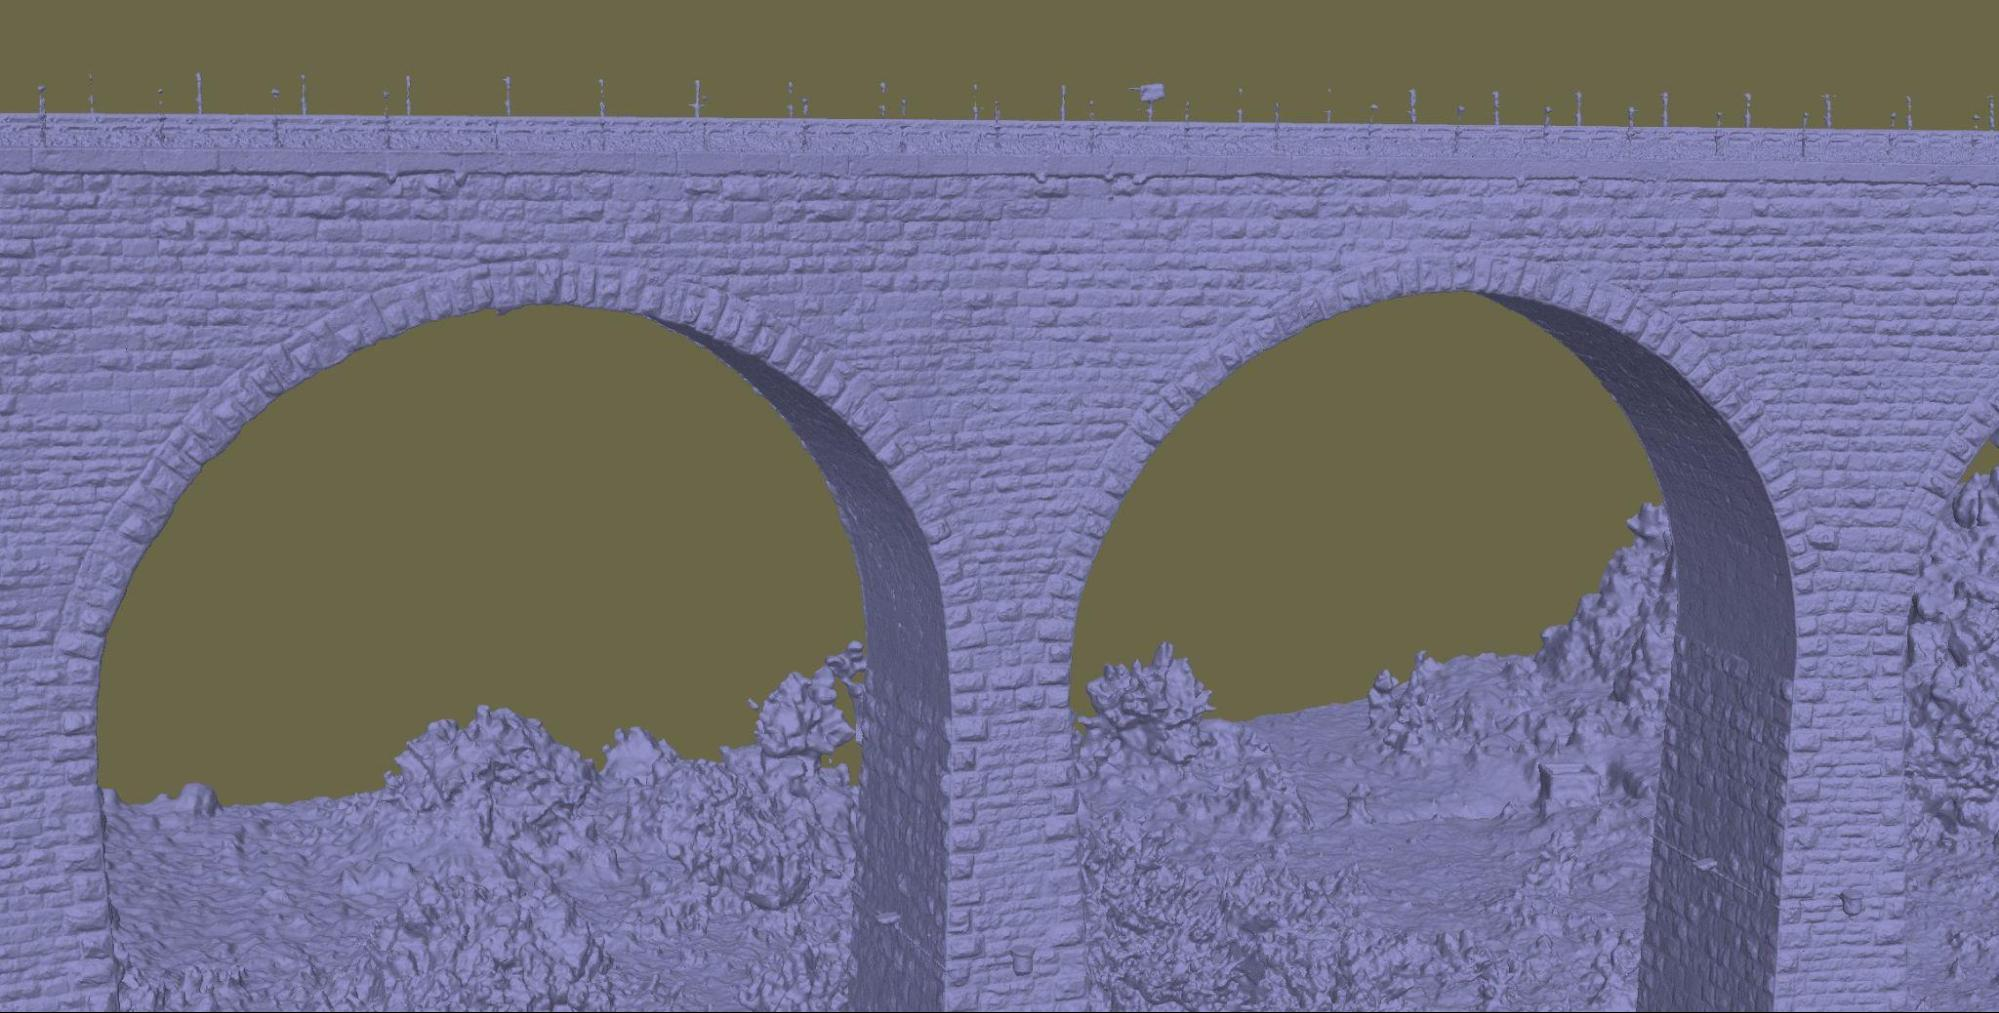 manari stone bridge 3d mesh image